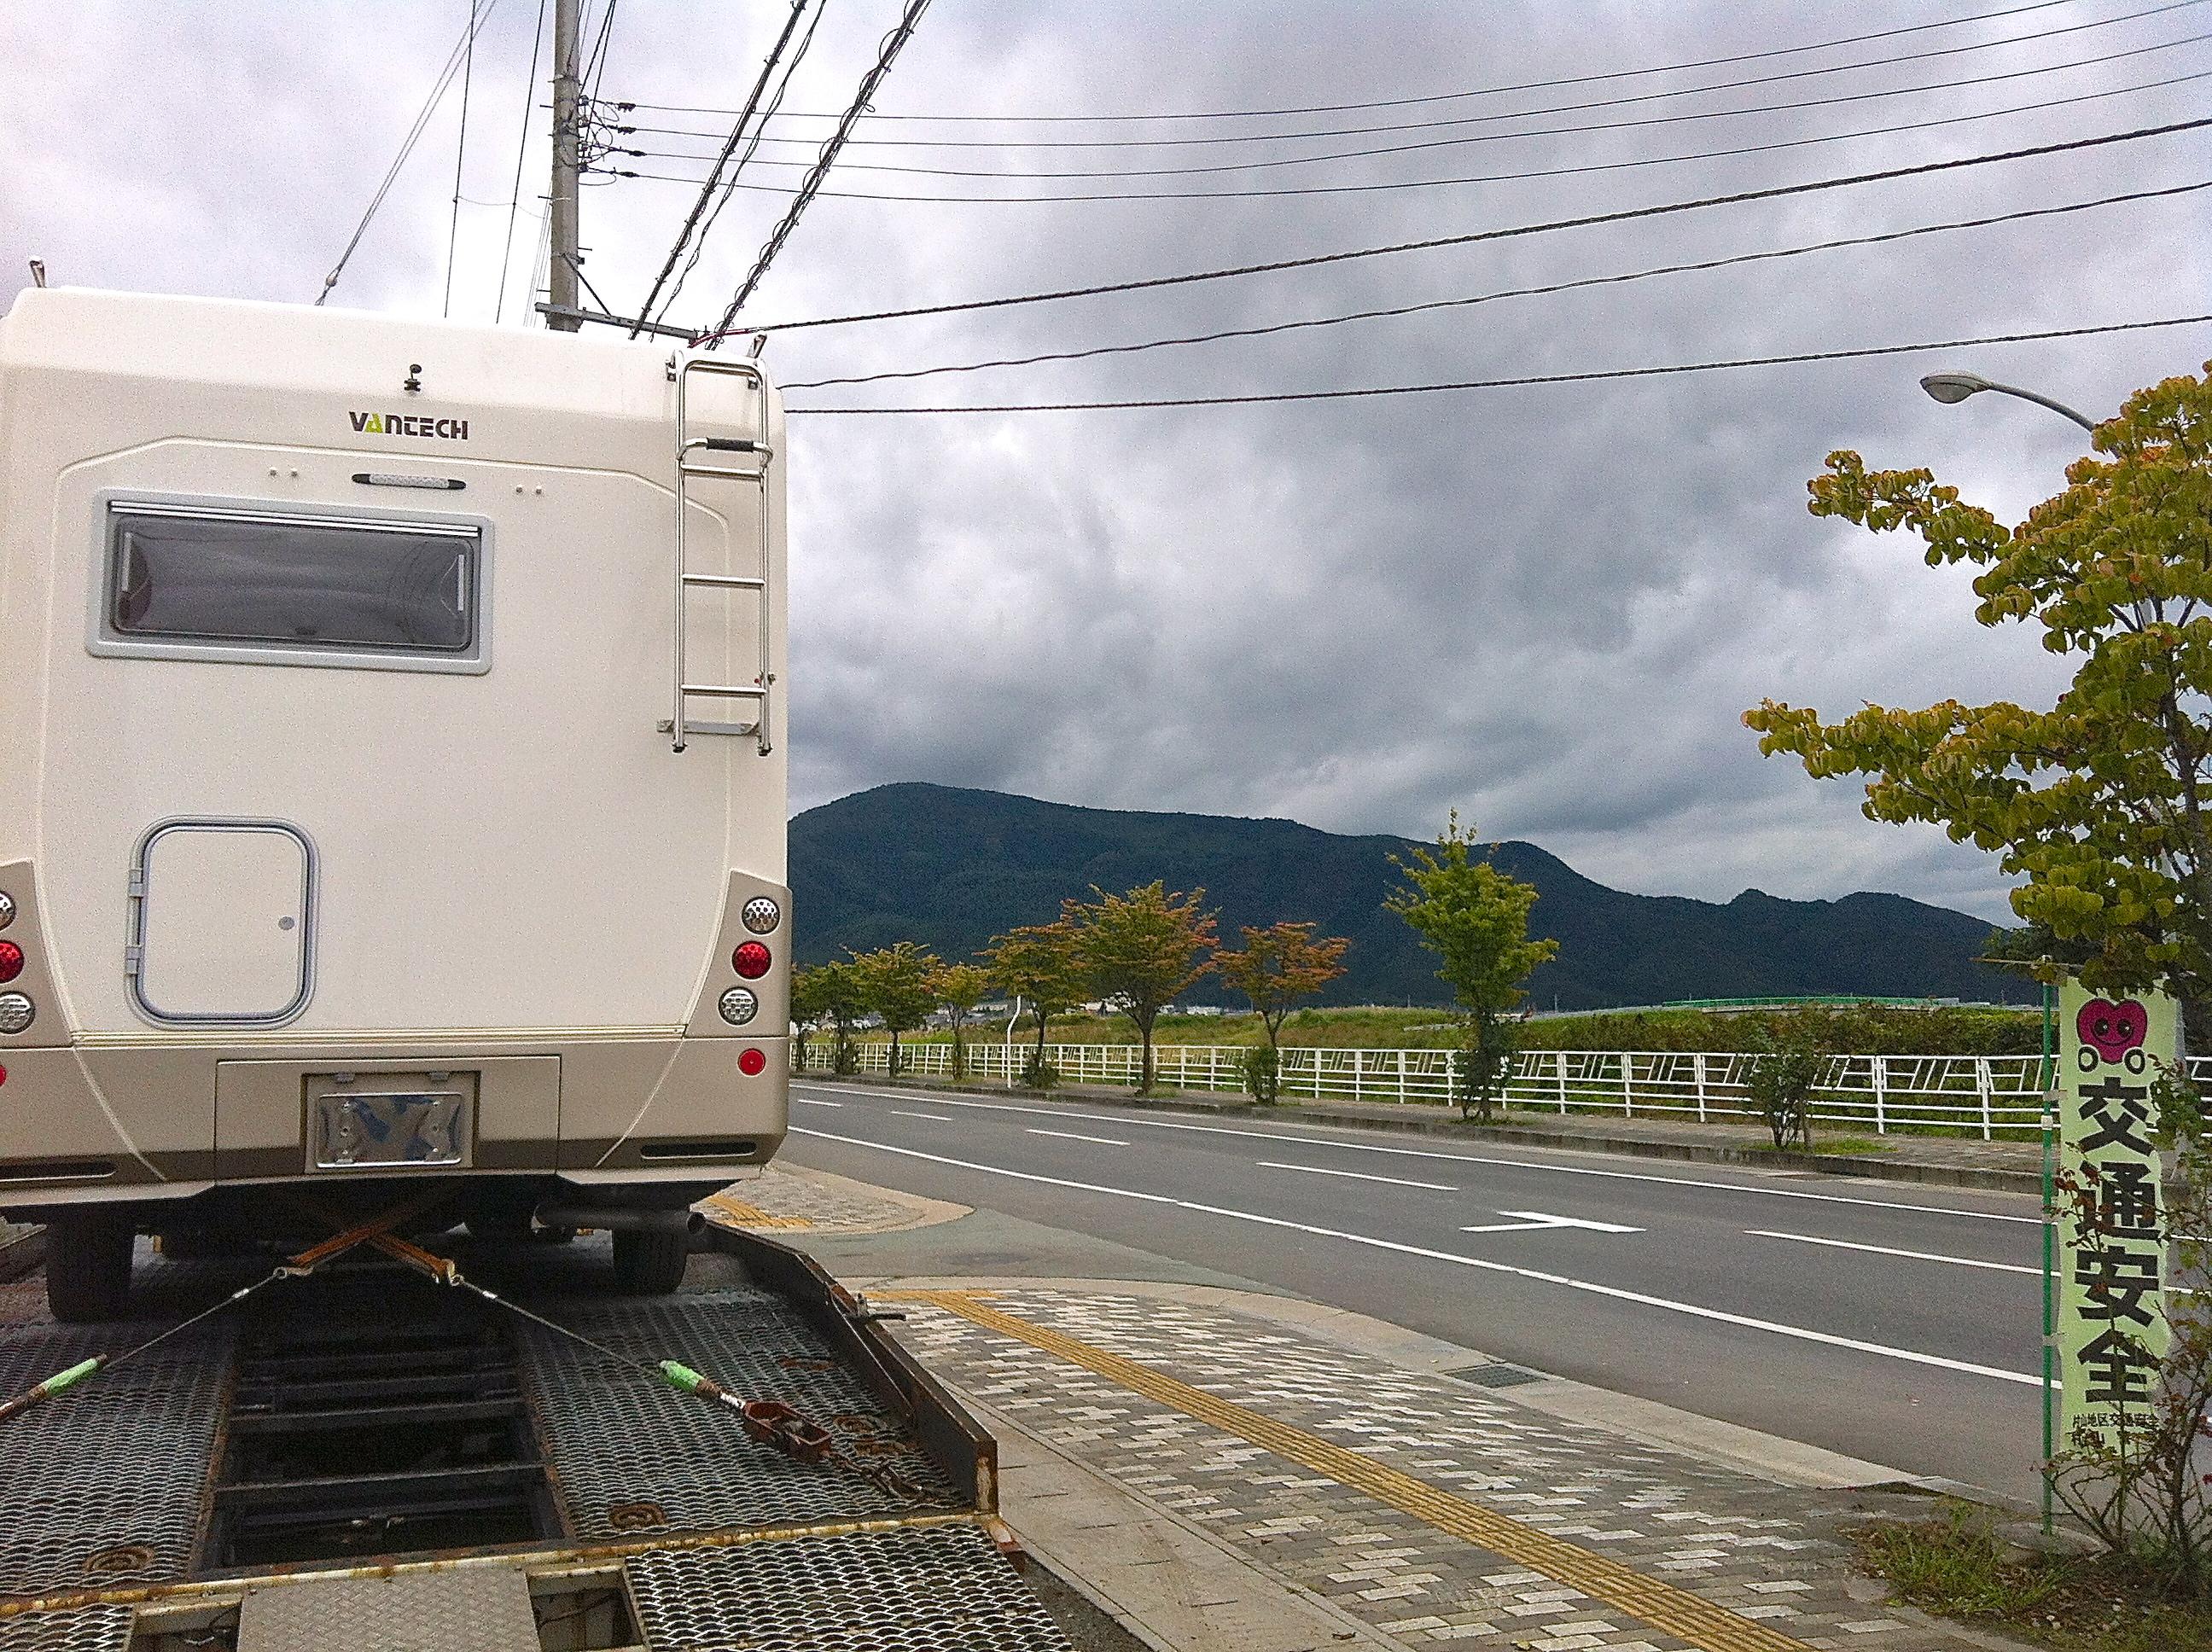 http://www.vantech.jp/shops/info/IMG_0346.JPG